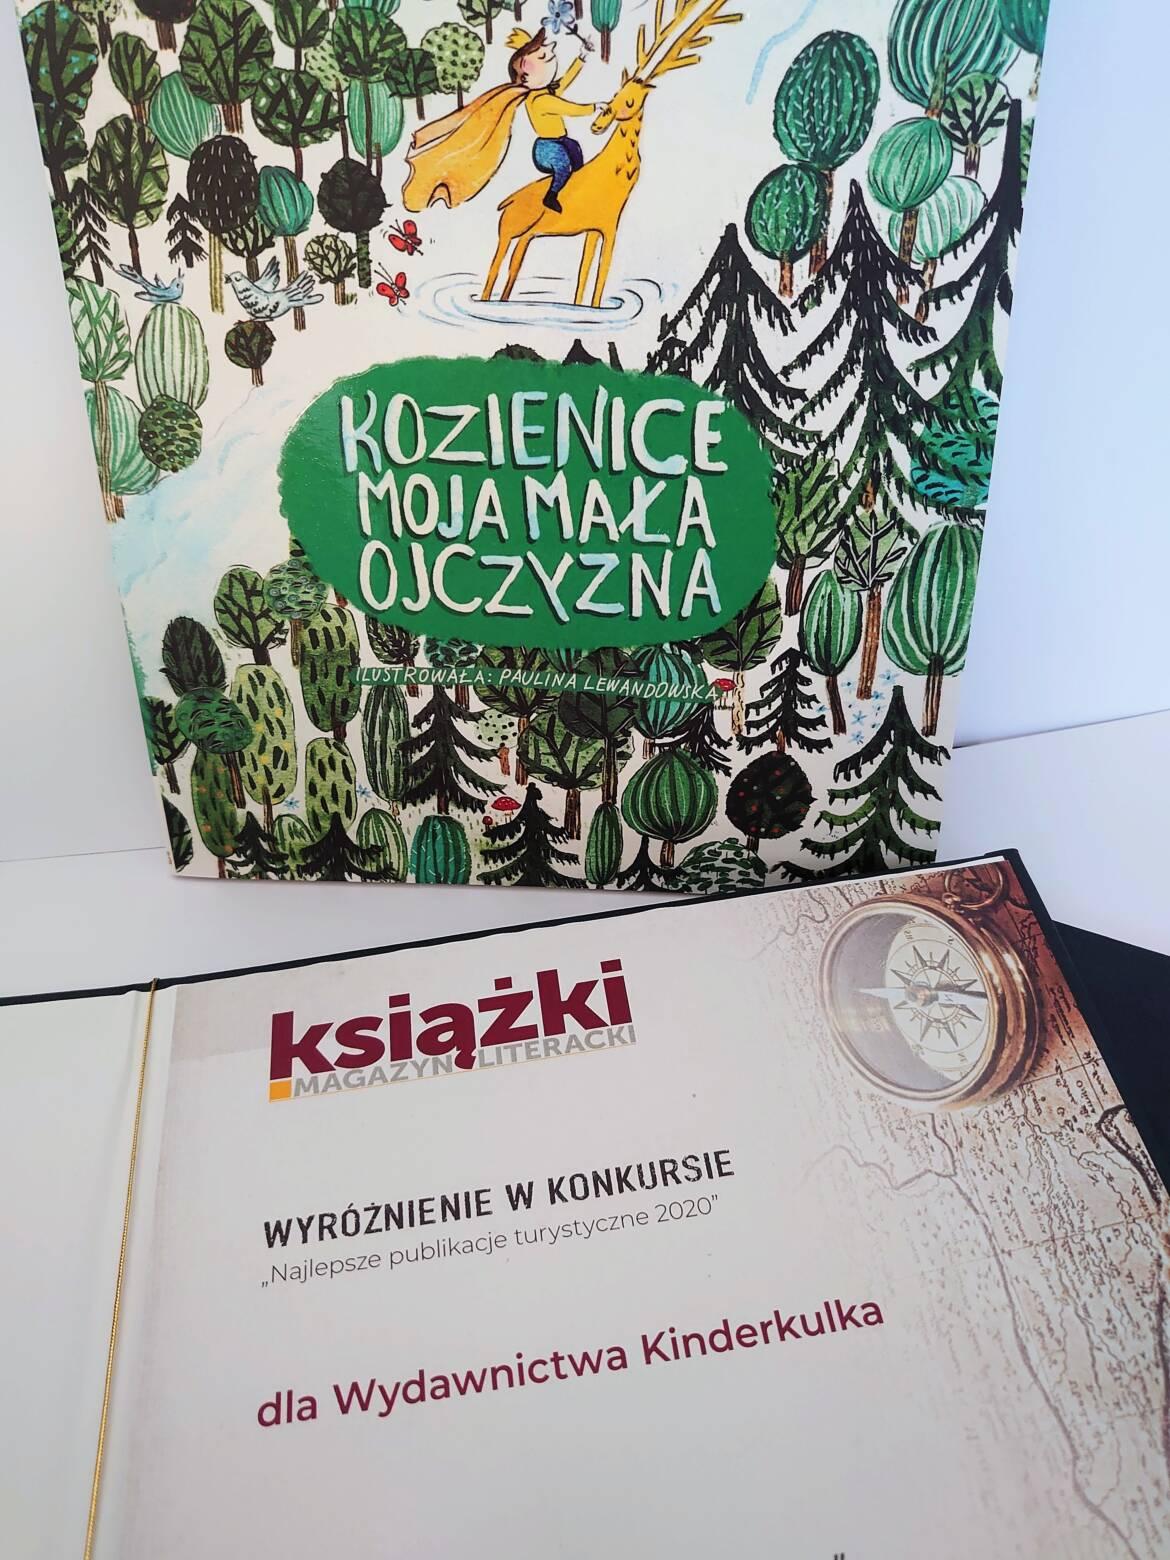 Kinderkulka_Kozienice_moja_mala_ojczyzna_6.jpg